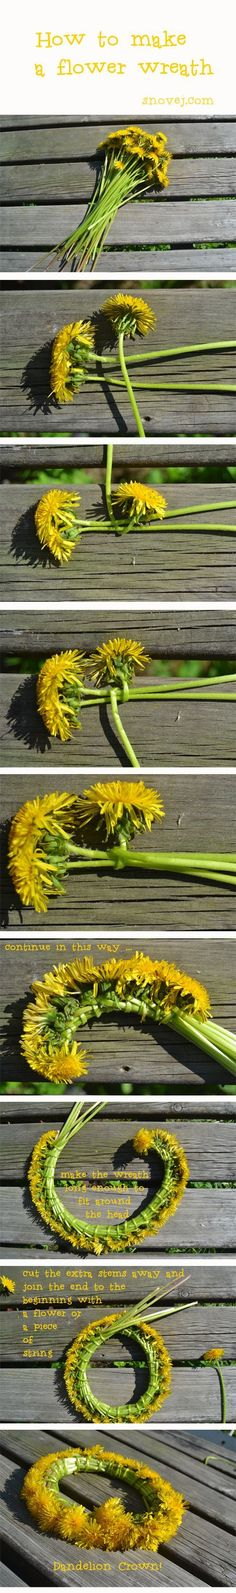 DIY Fresh Flower Heart Wreath is part of Diy flower crown - Diy Flower Crown, Flower Crowns, Diy Flowers, Flower Crown Drawing, Diy Crafts Hacks, Cute Crafts, Diys, Fleurs Diy, Things To Do When Bored